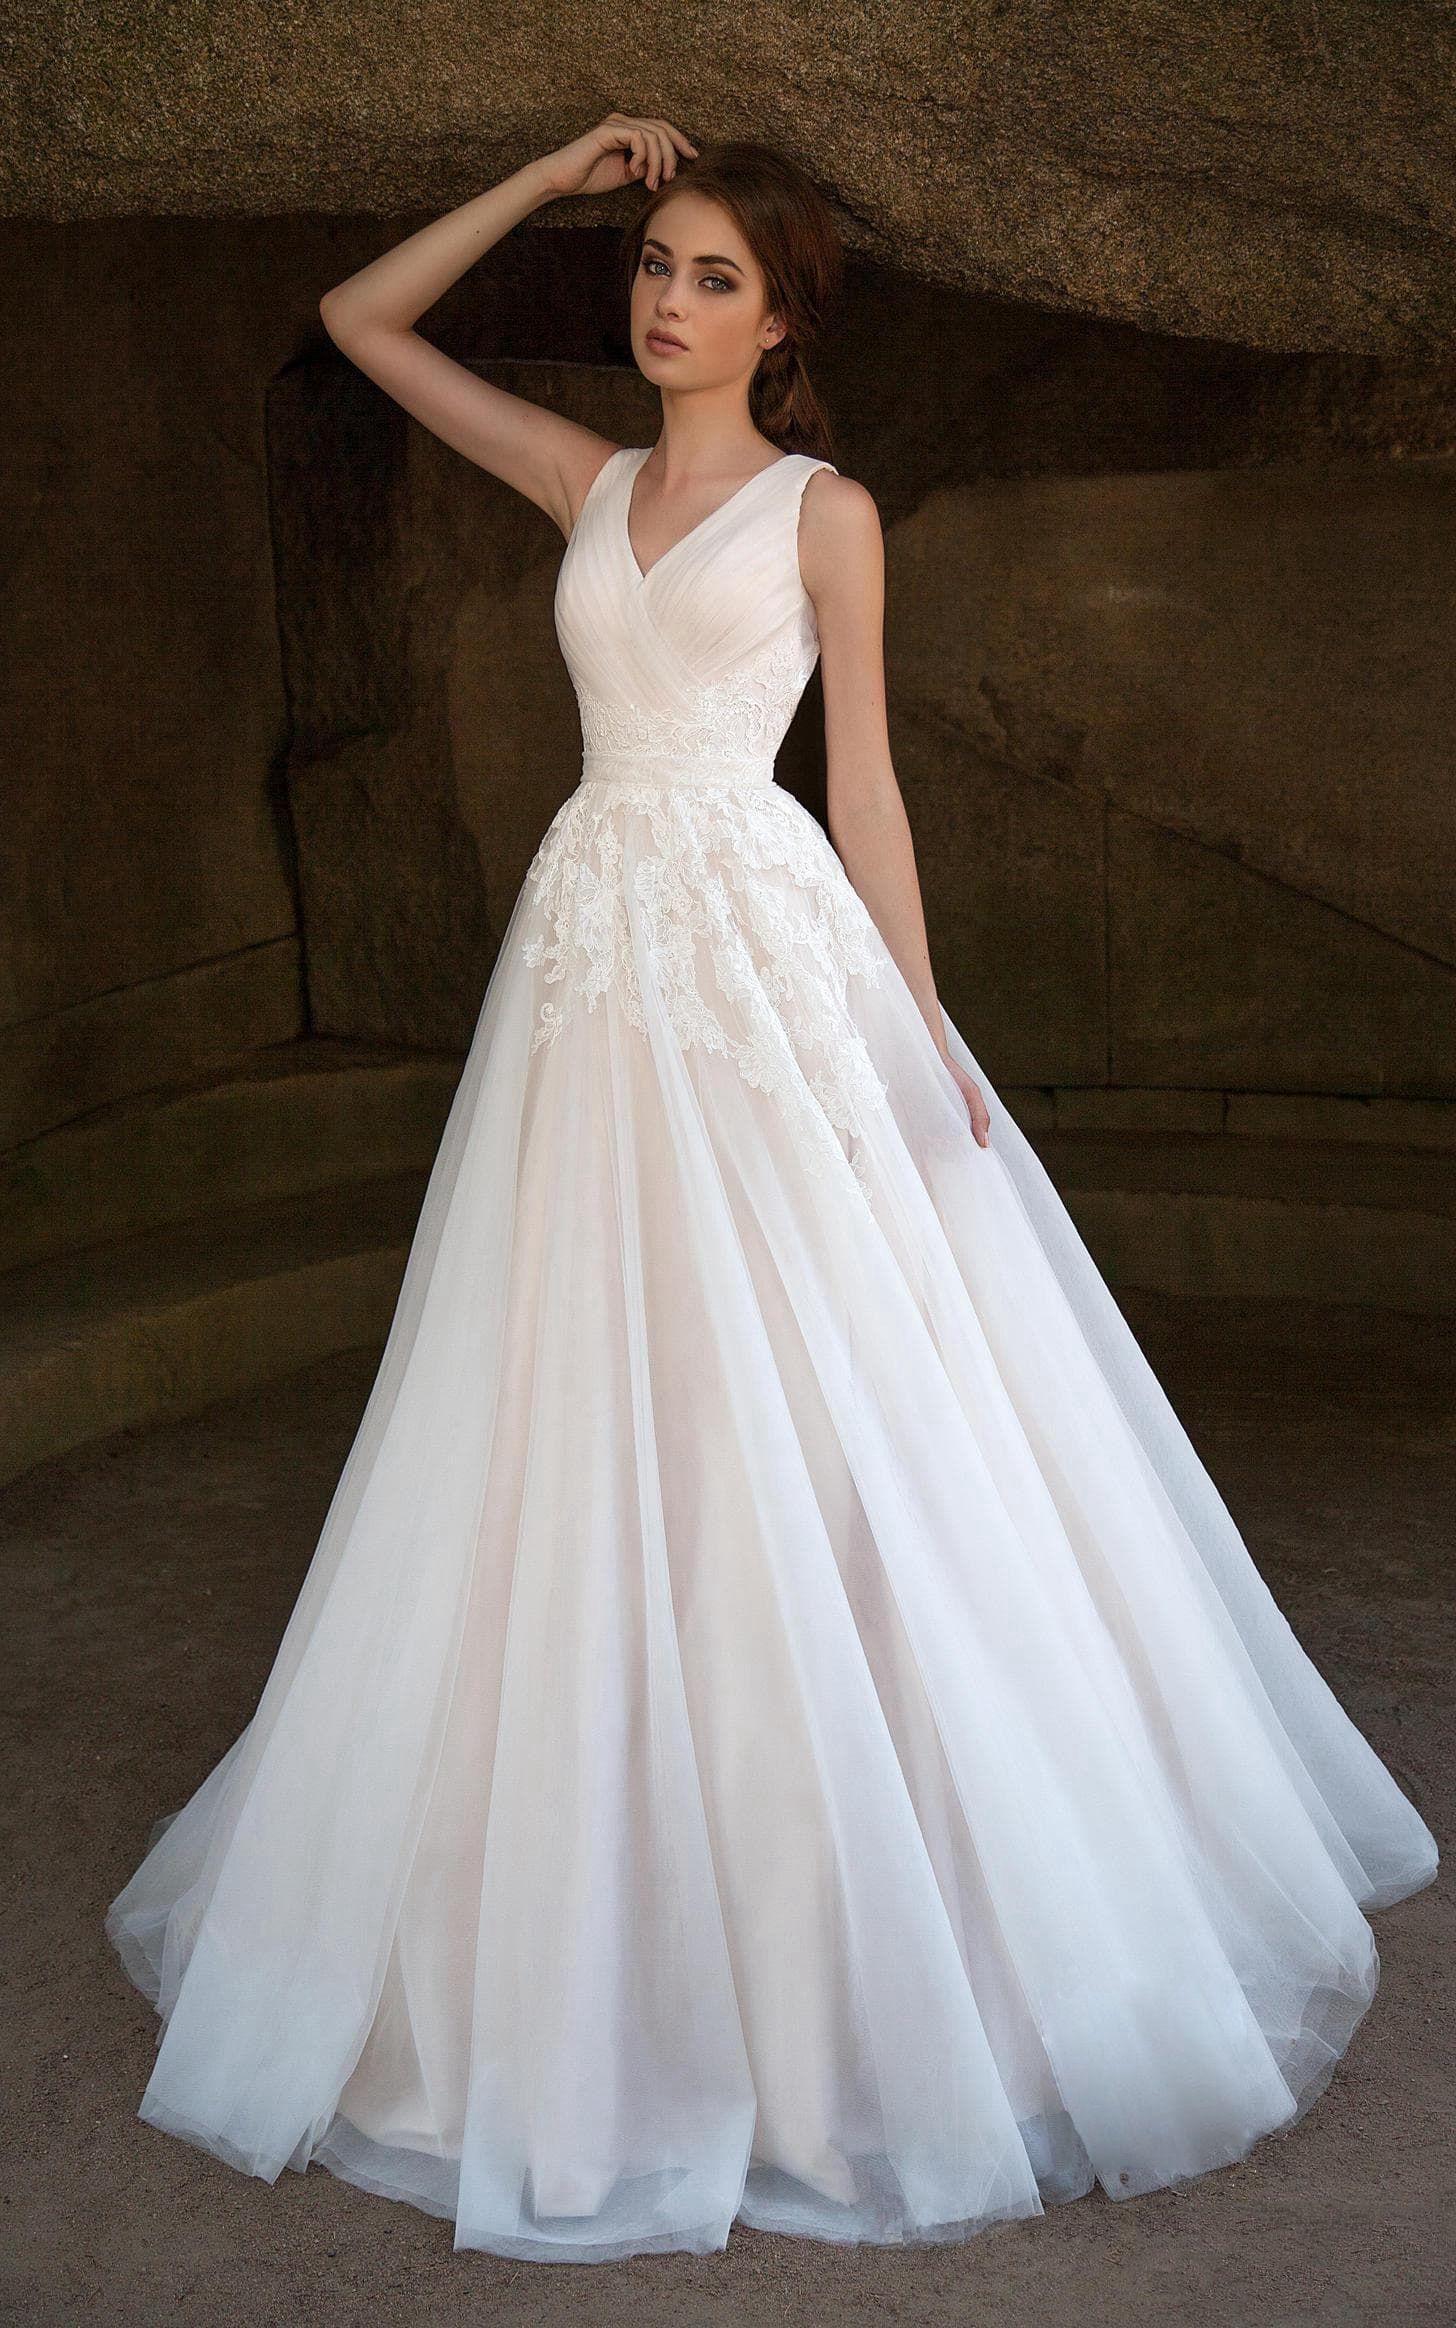 Riswedding gorgeous off the shoulder wedding dresses